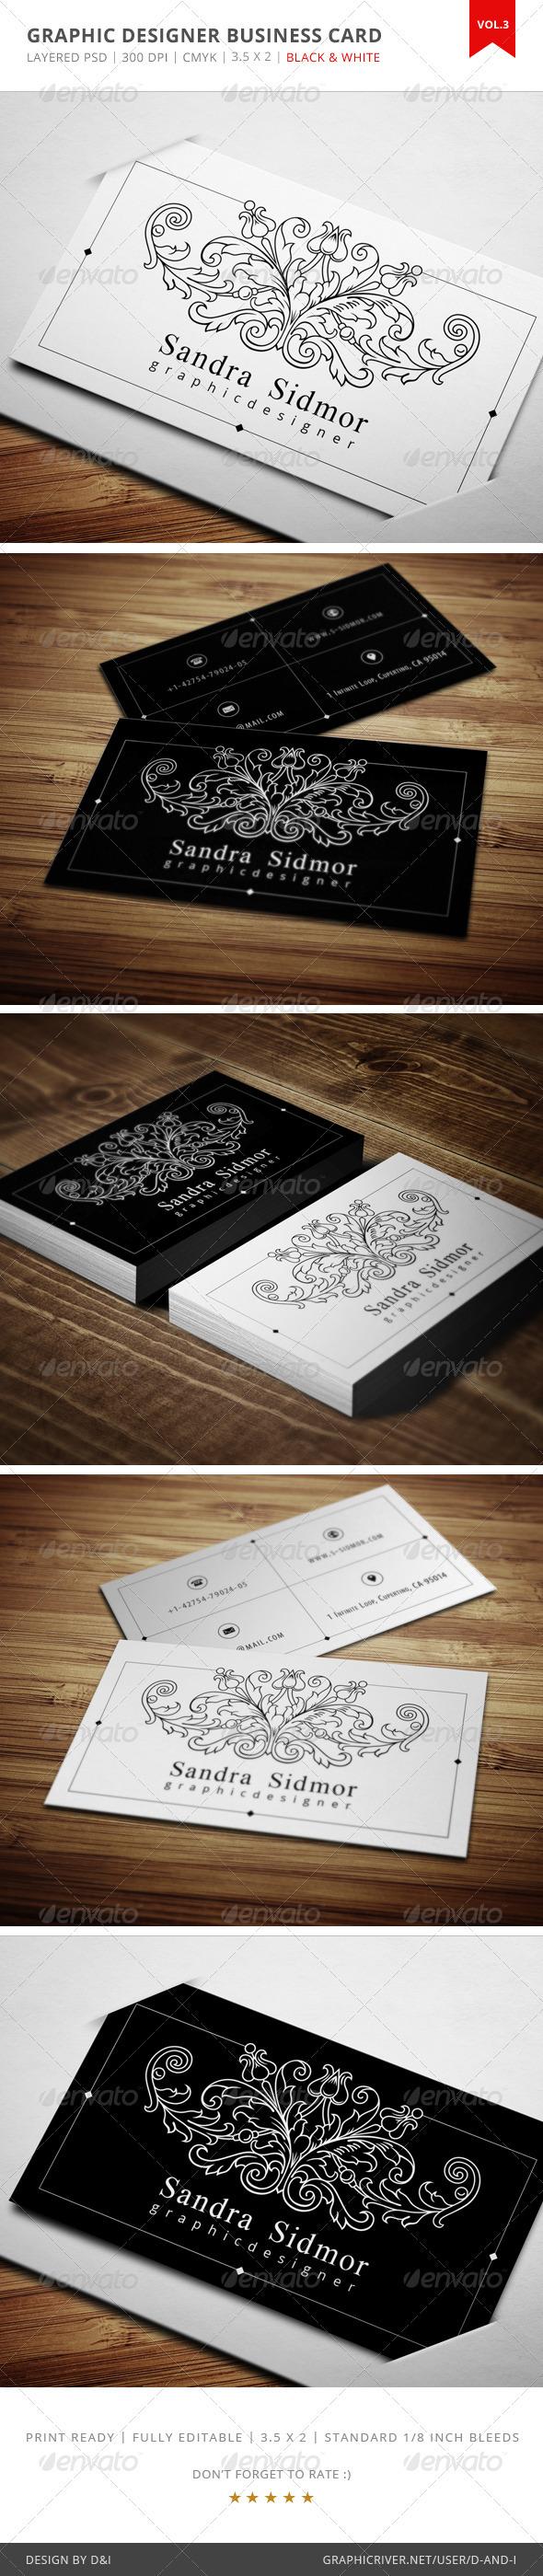 GraphicRiver Graphic Designer Business Card Vol.3 4027410